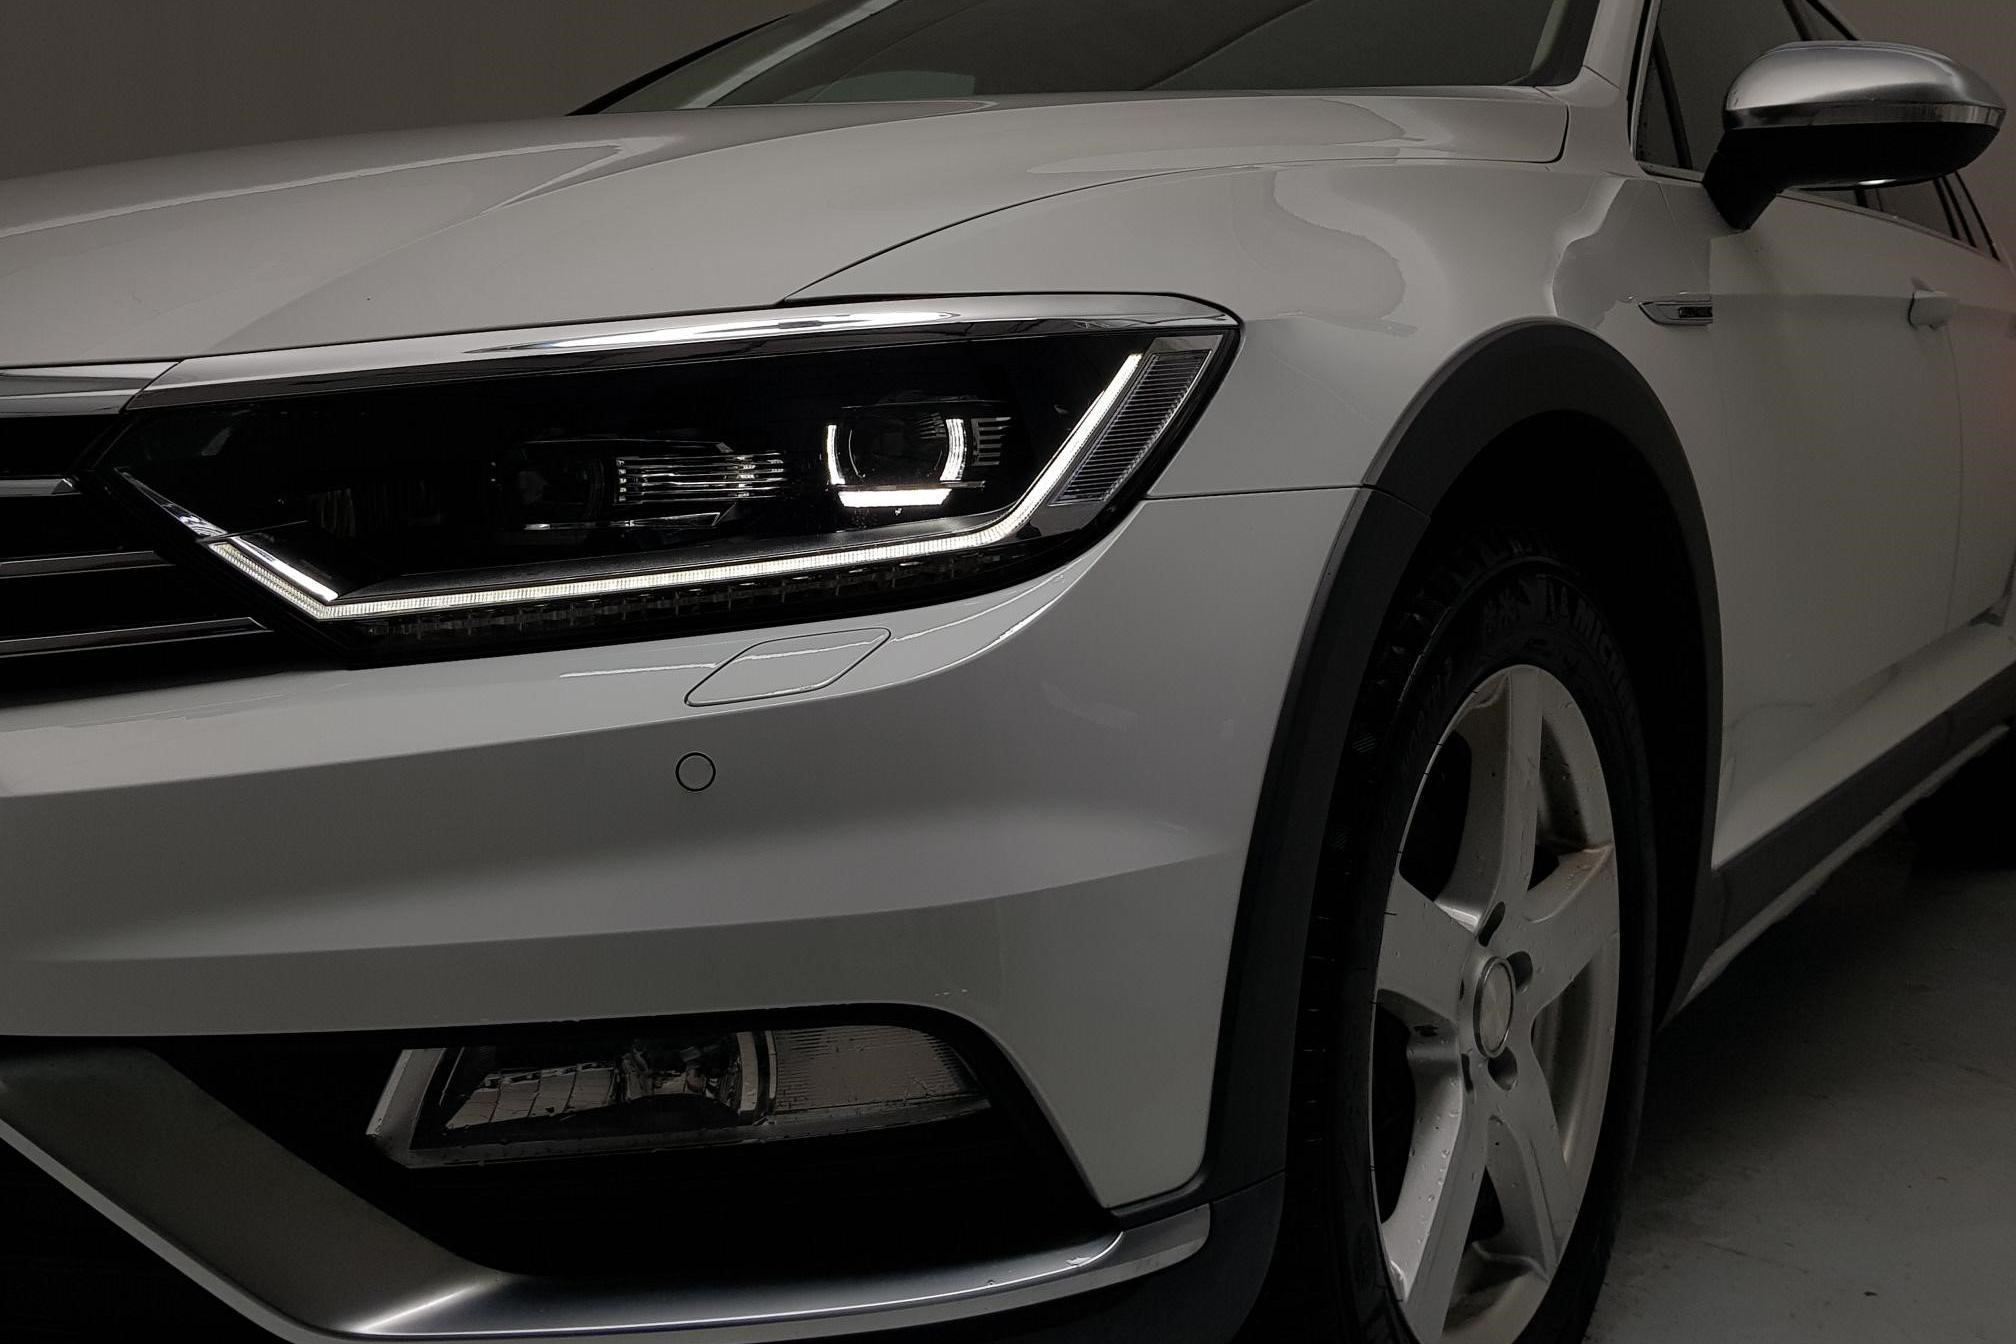 VW Passat Alltrack 2.0 TDI Sportscombi 4MOTION (190hk) - 105 270 km - Automatic - white - 2017